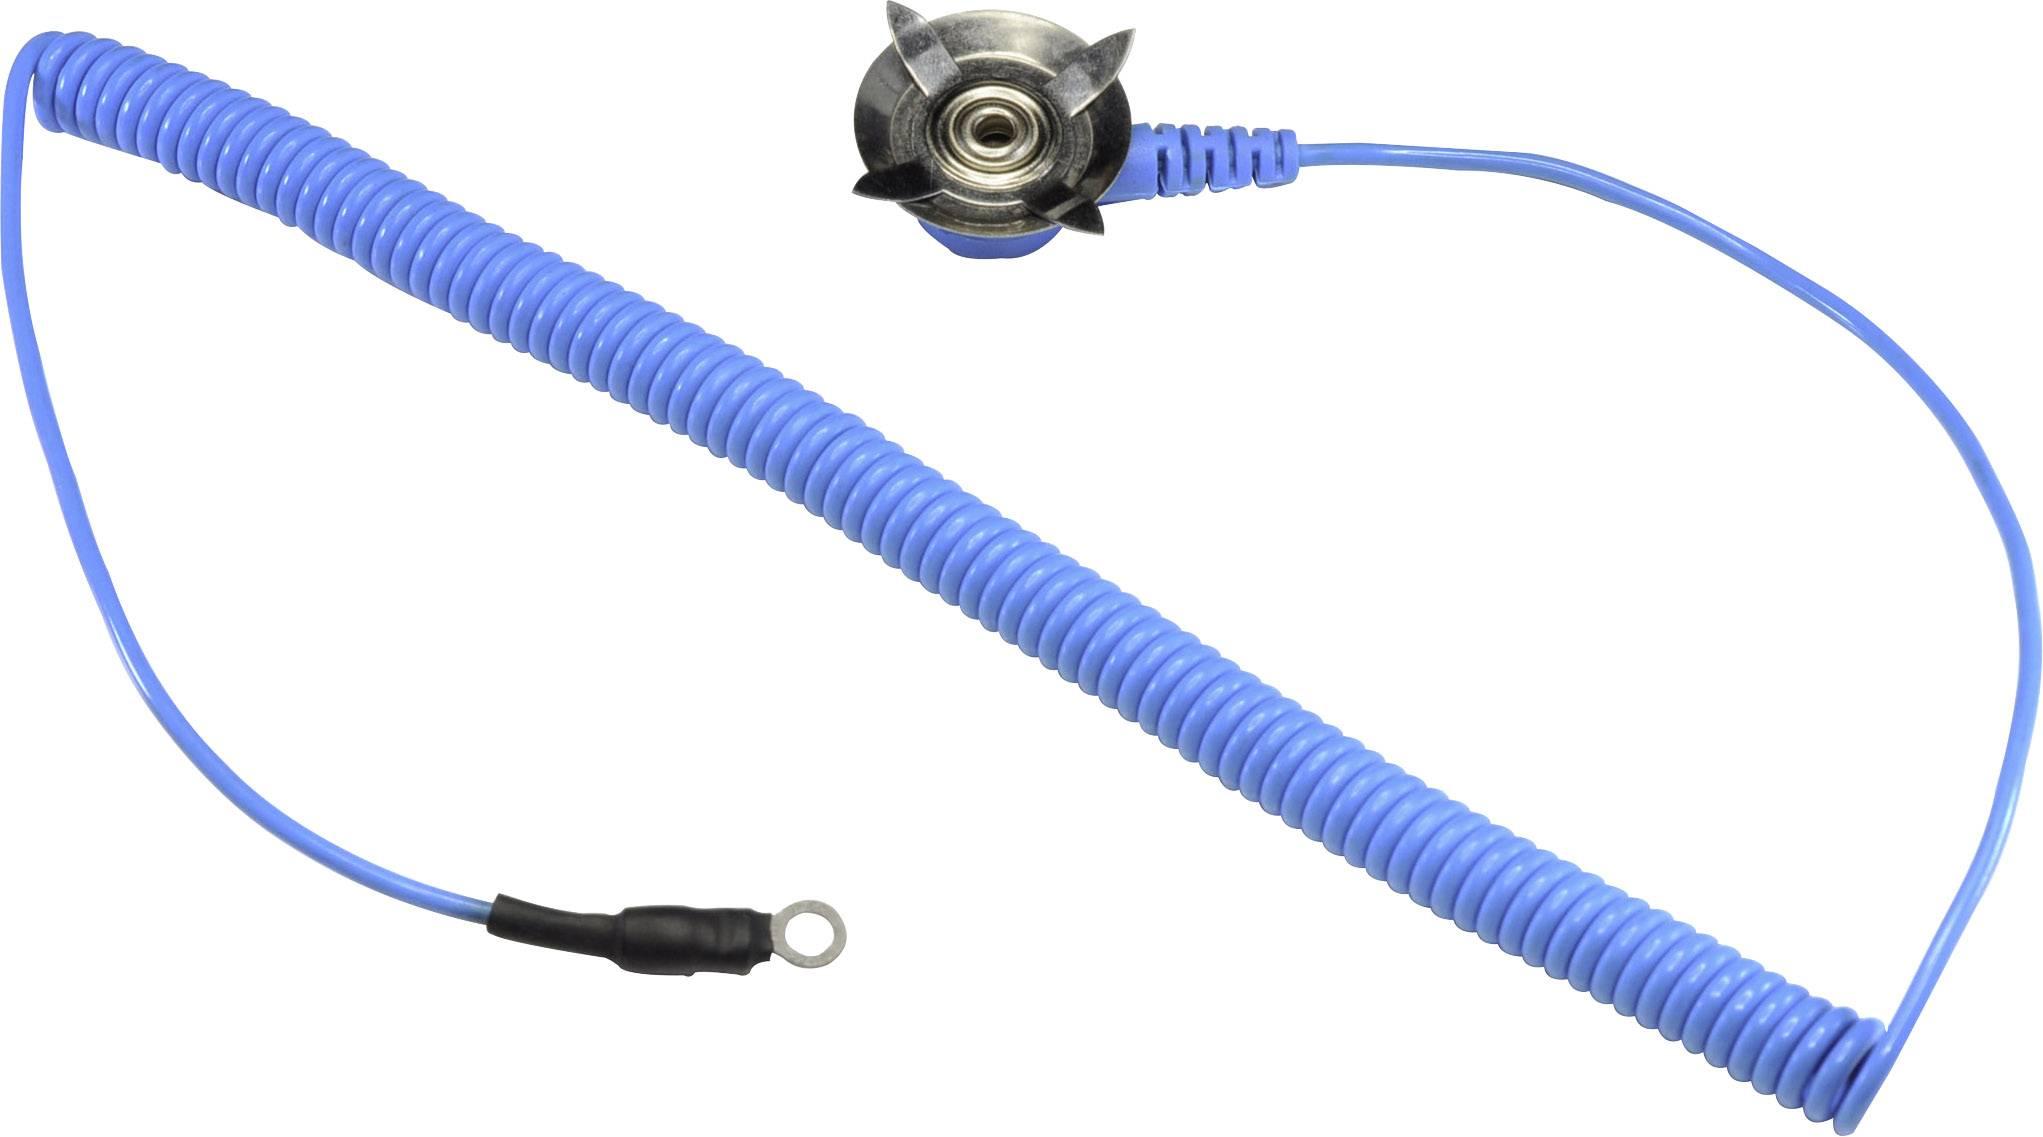 ESD zemnicí kabel k rohoži Conrad Components EkA-183-AD-R, 1.83 m EkA-183-AD-R prstencové očko 4 mm